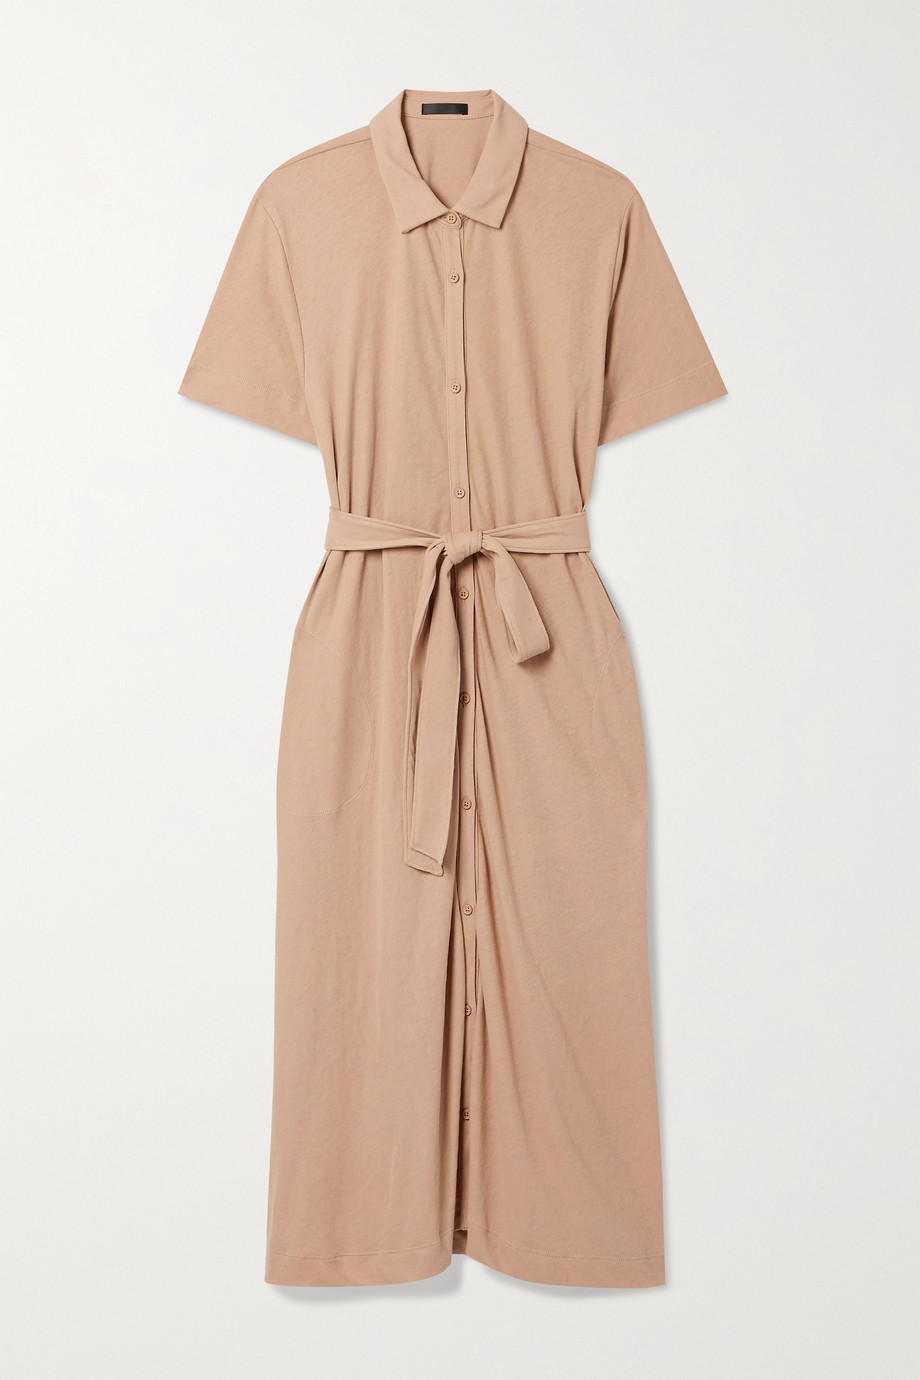 ATM Anthony Thomas Melillo High Torsion Hemdblusenkleid aus Baumwoll-Jersey mit Bindegürtel